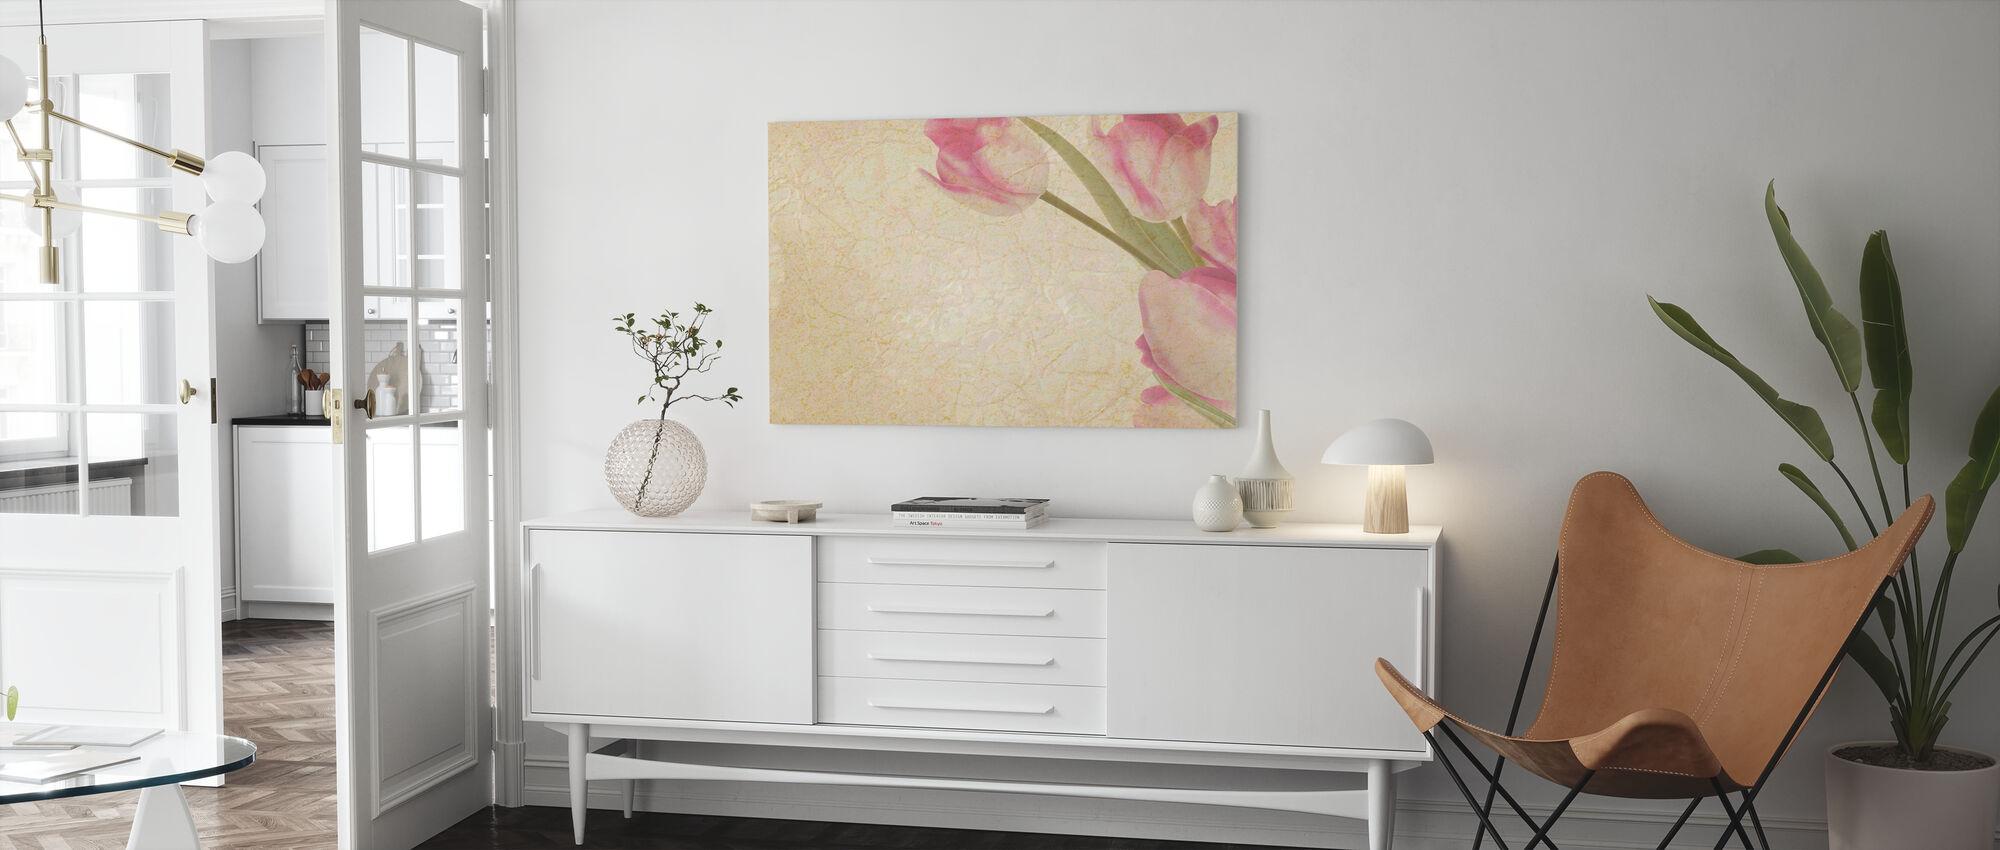 Vintage Tulpen - Canvas print - Woonkamer